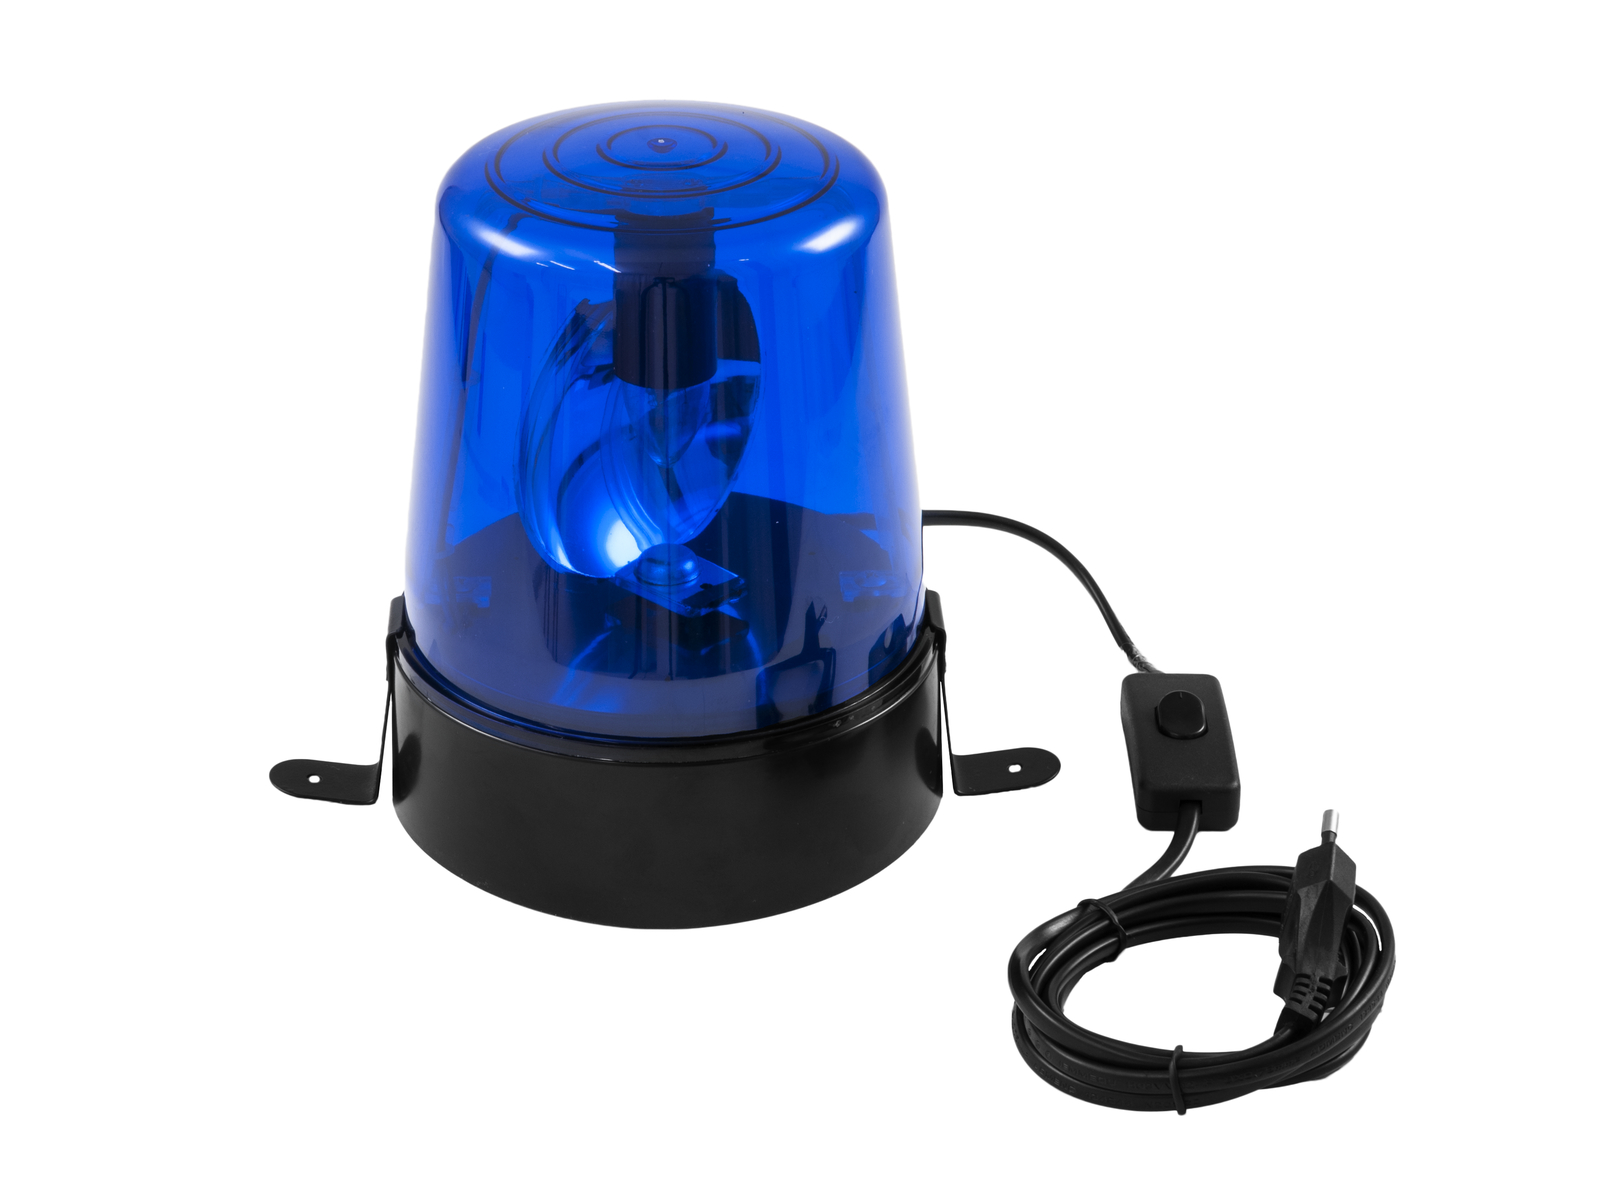 eurolite-led-polizeilicht-de-1-blau